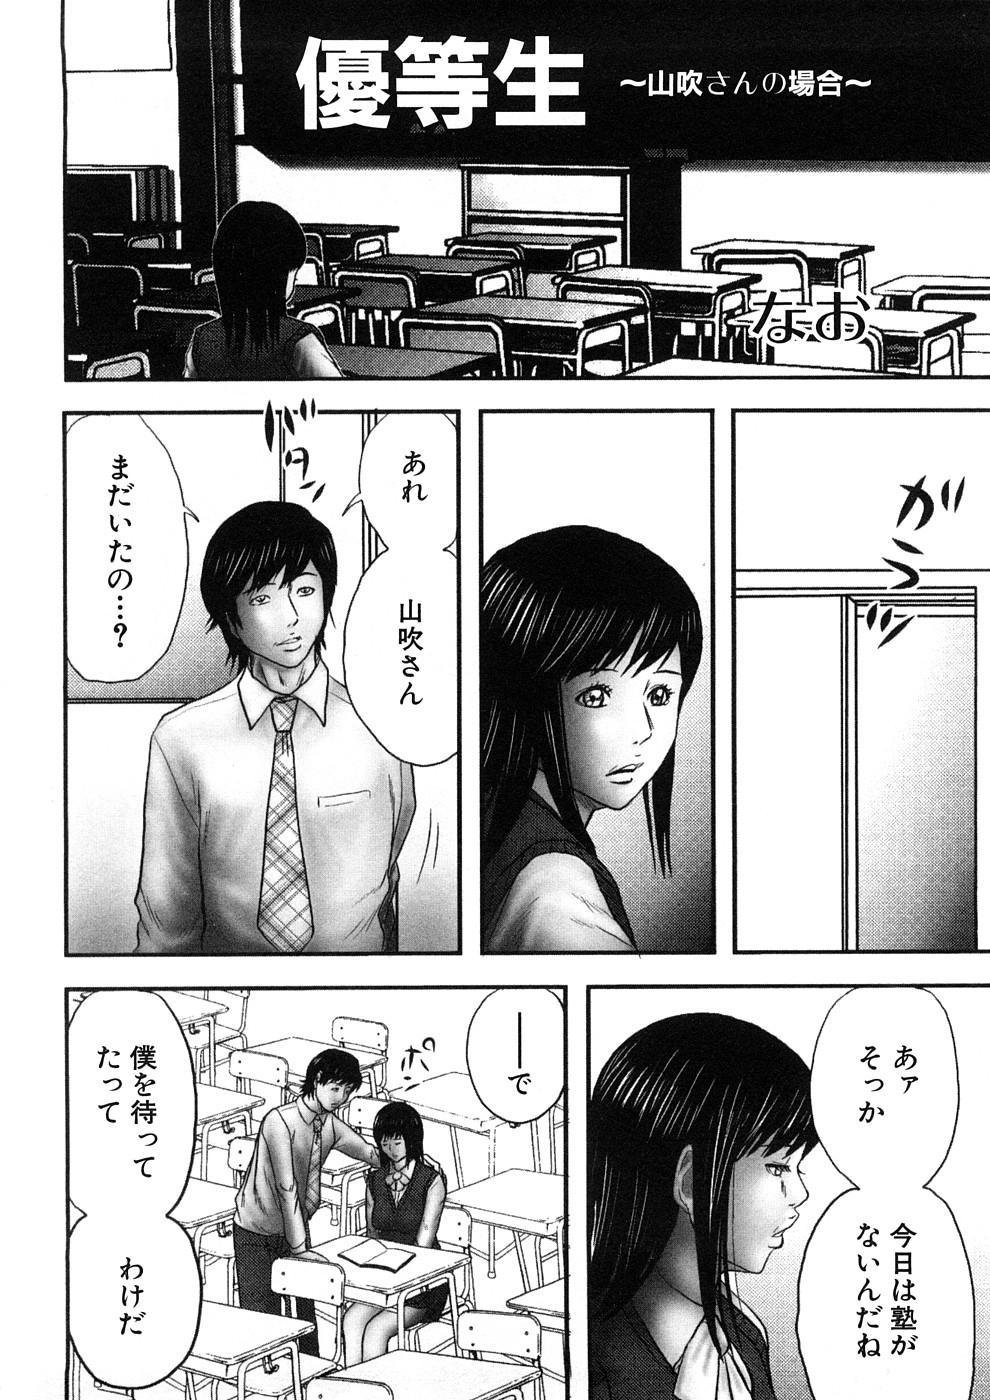 Geki Yaba Anthology Vol. 1 - Naka ni Dashite yo 220